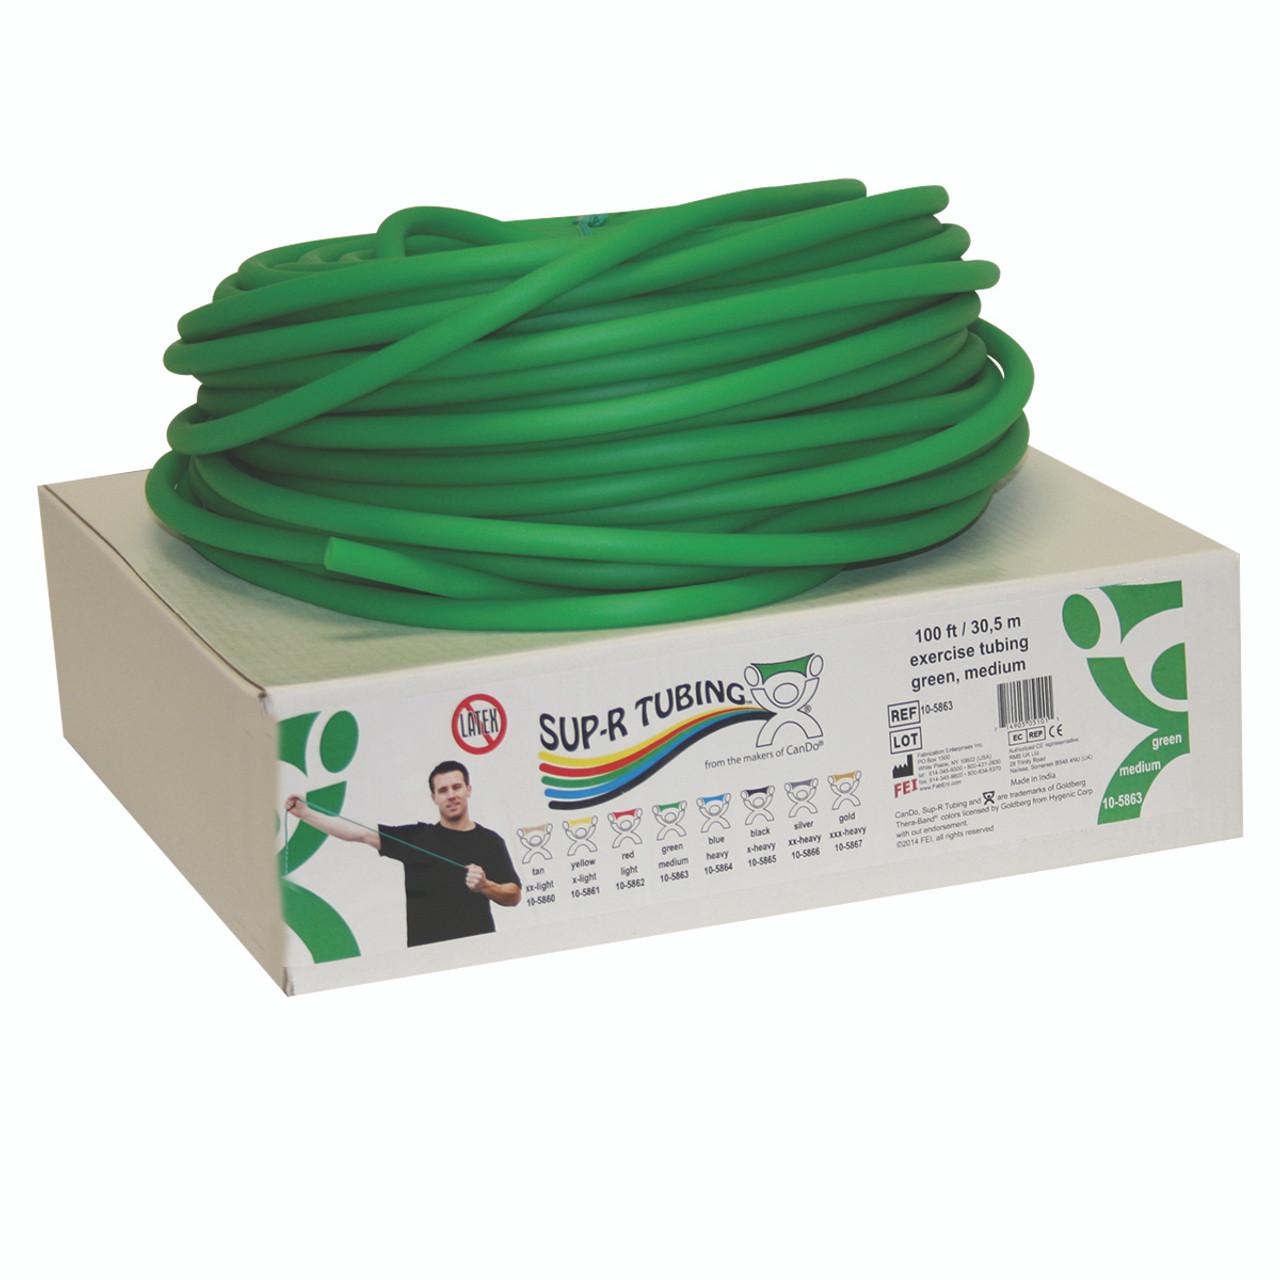 Sup-R Tubing¨ - Latex Free Exercise Tubing - 100' dispenser roll - Green - medium